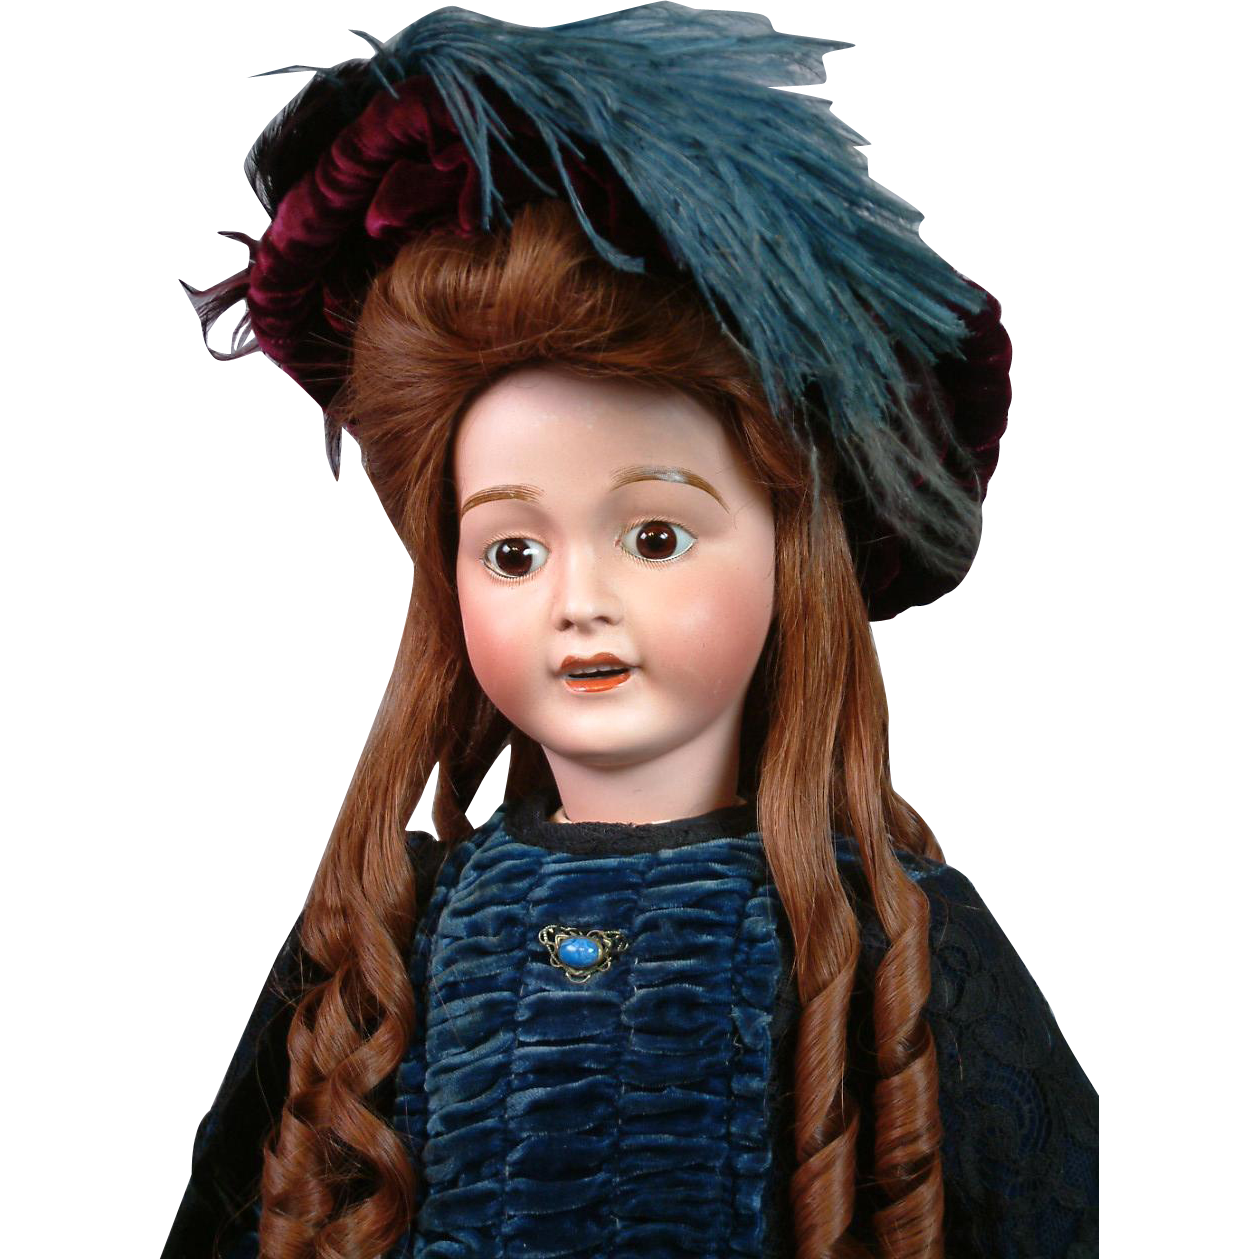 "The Elegant 25"" Big Antique Lanternier Limoges Girl Doll in Alluring Presentation Costume"